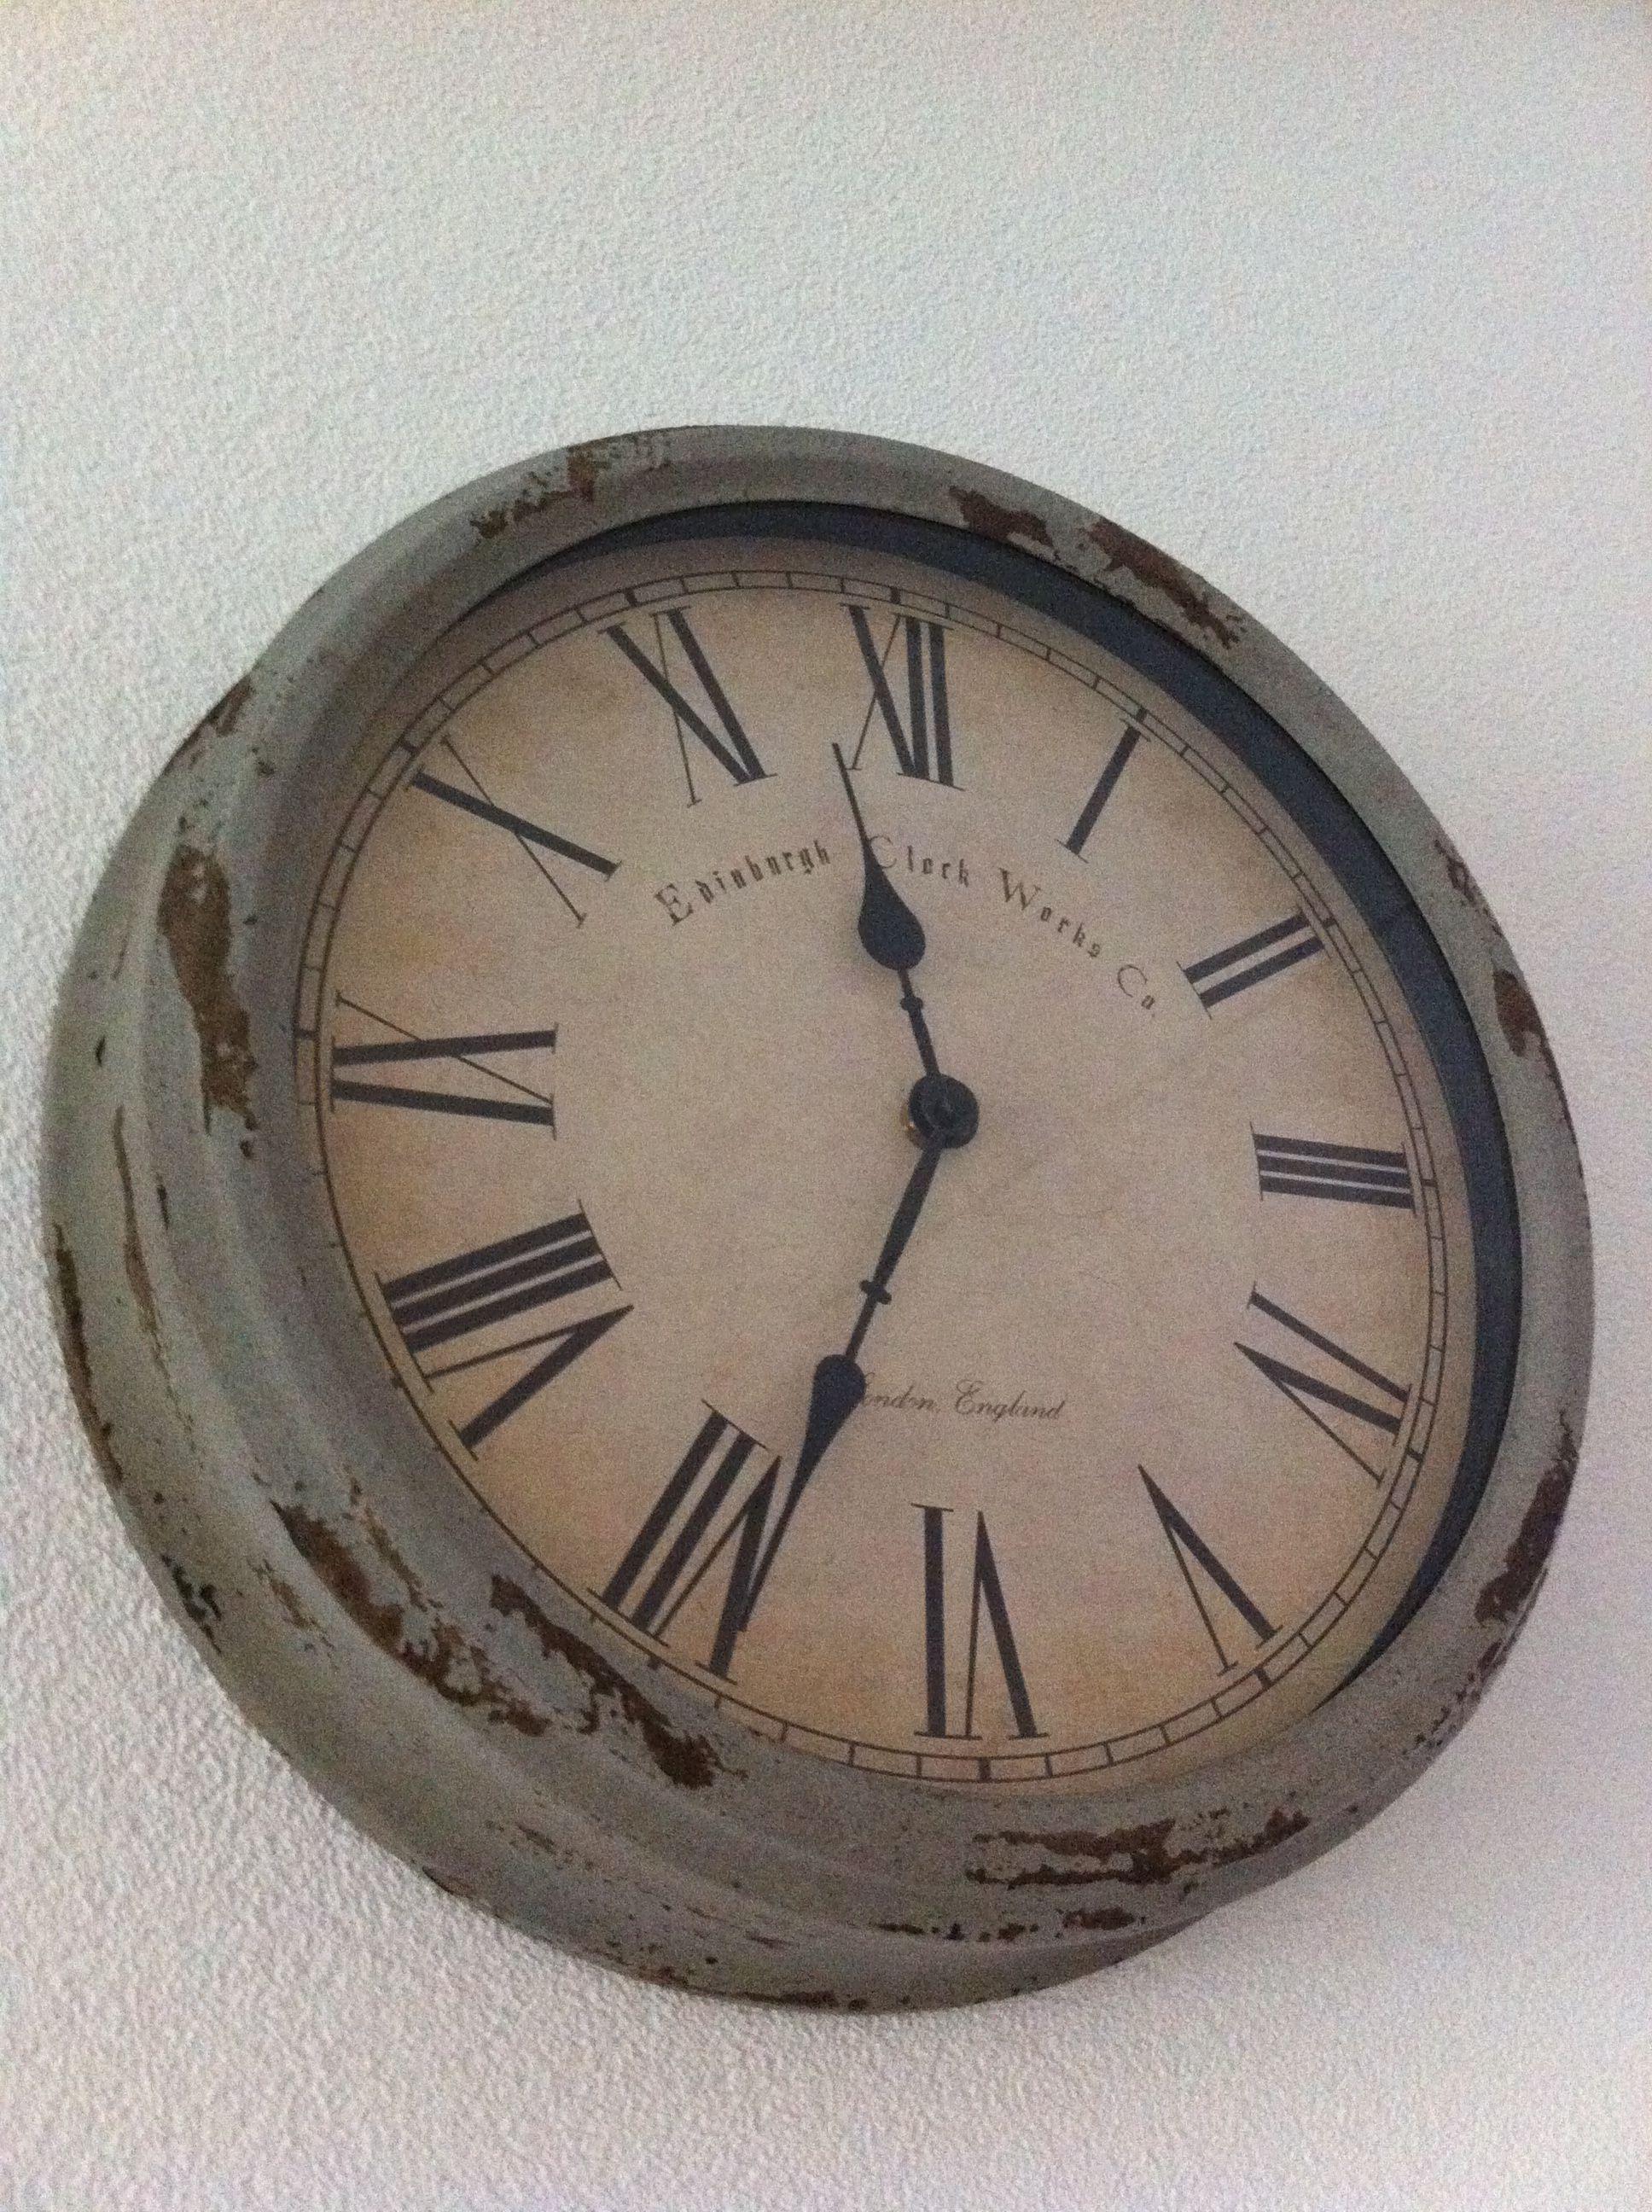 Woonkamer: Klok | Clocks | Pinterest | Mood boards and Clocks